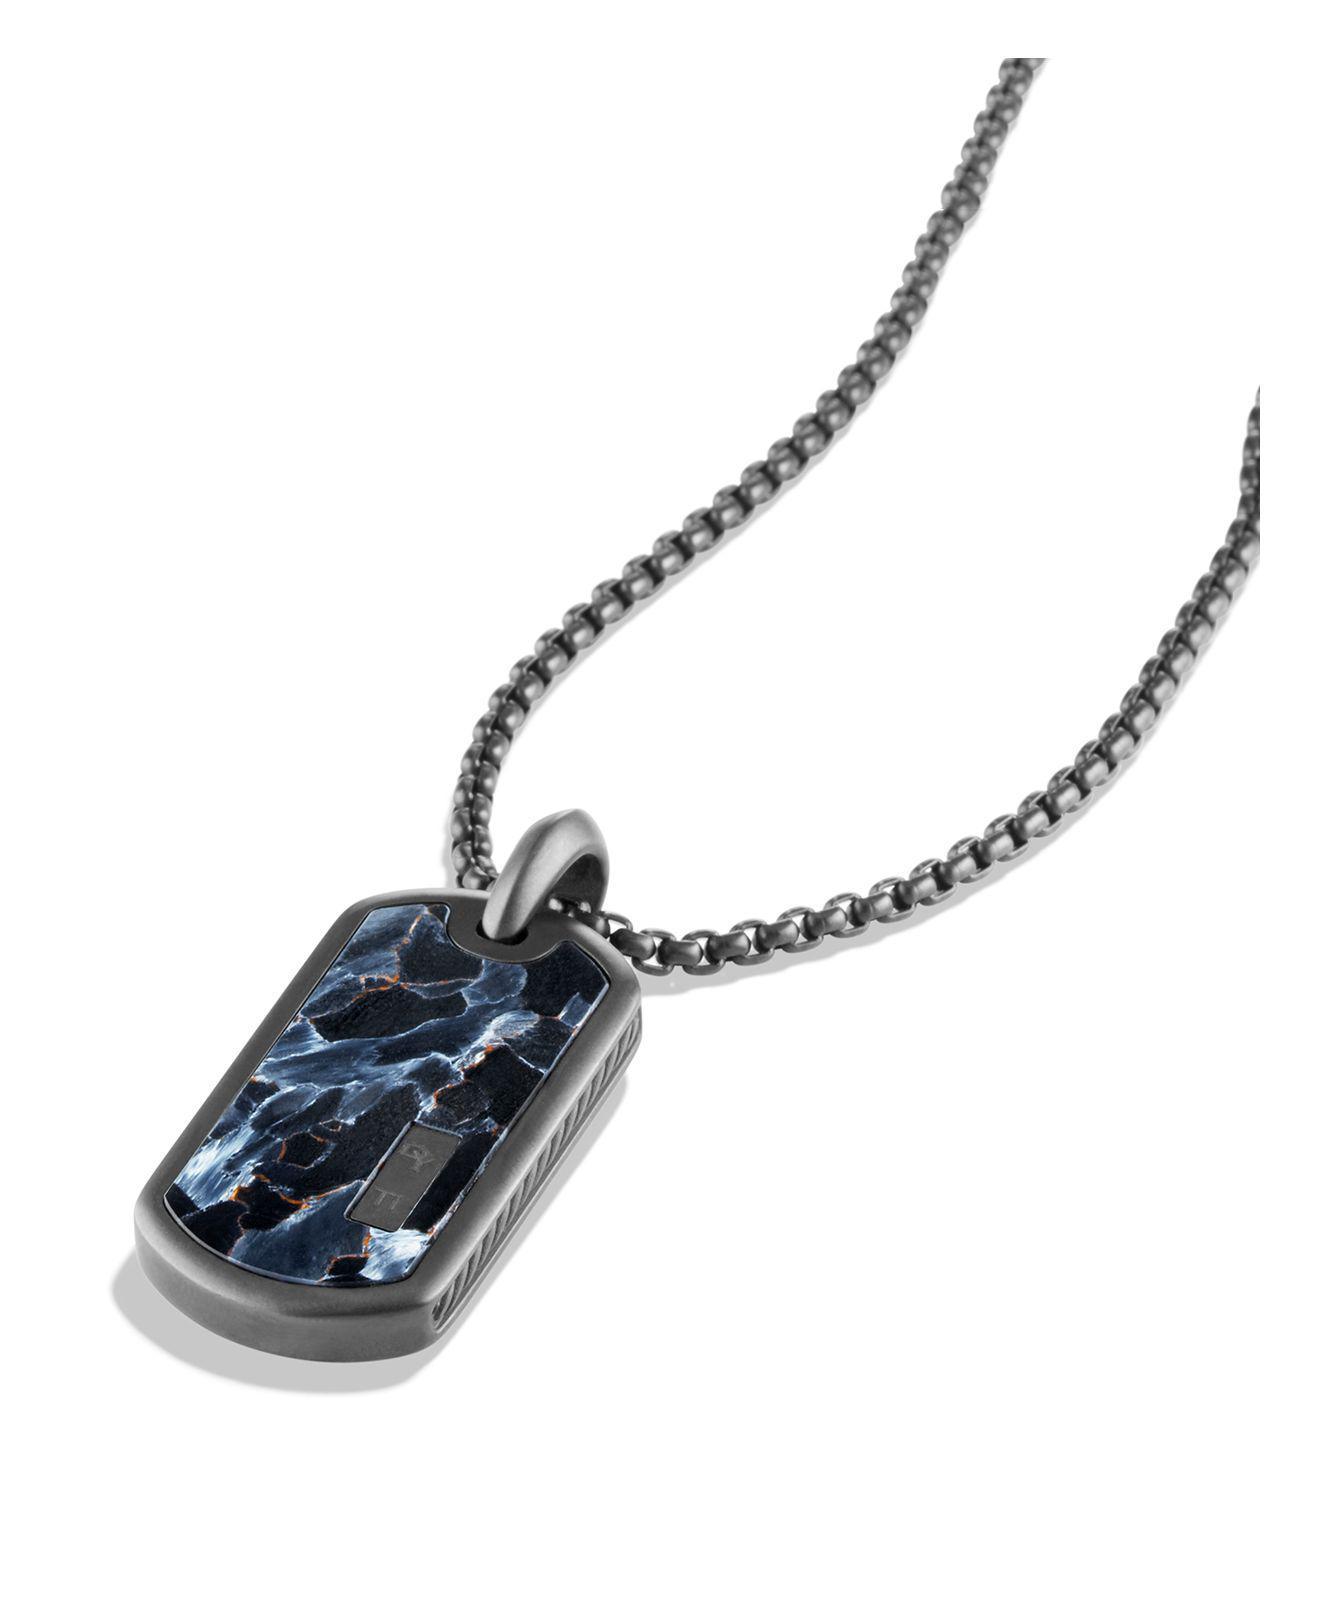 David Yurman Exotic Stone Enhancer pietersite tag - Black iopwtvYWPW